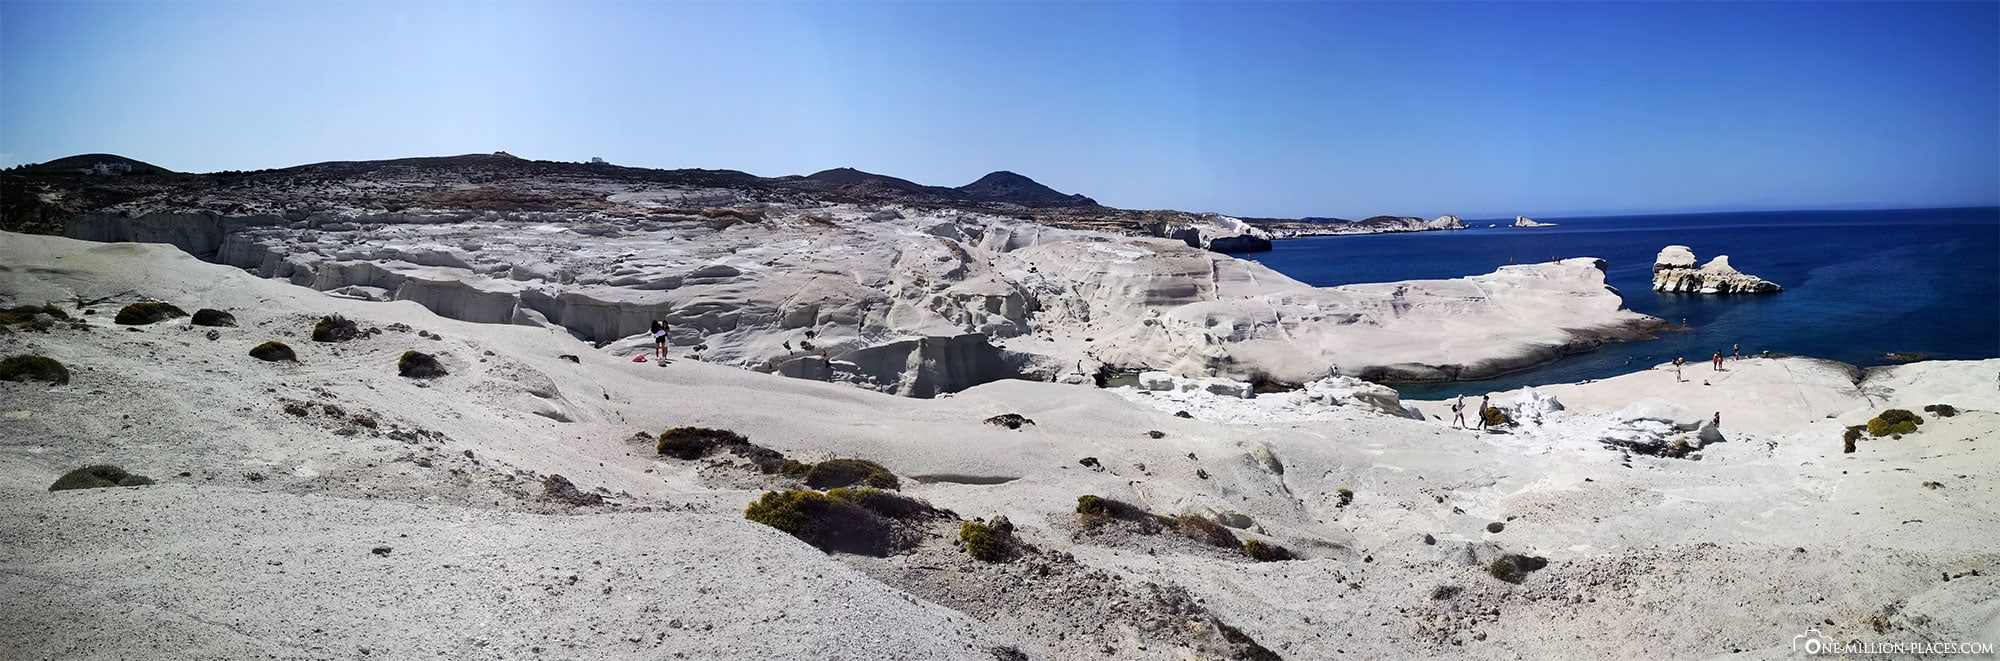 Sarakiniko, Milos, Cyclades, Greece, Attractions, Pictures, Travel Blog